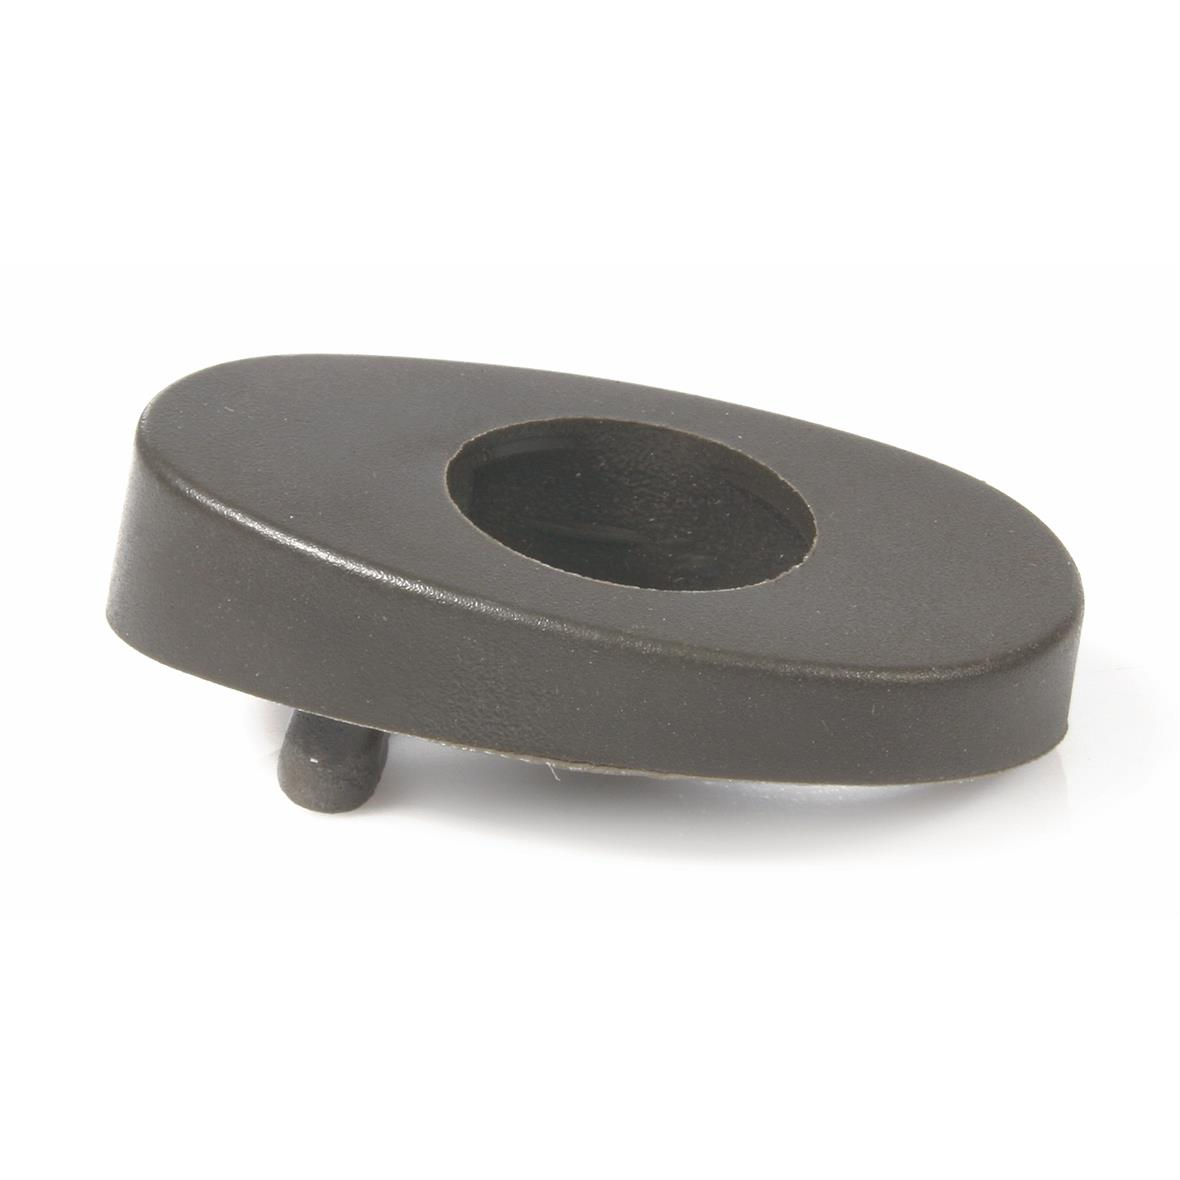 Product Image for 'Rubber mirror Vespa Cosa 2rightTitle'